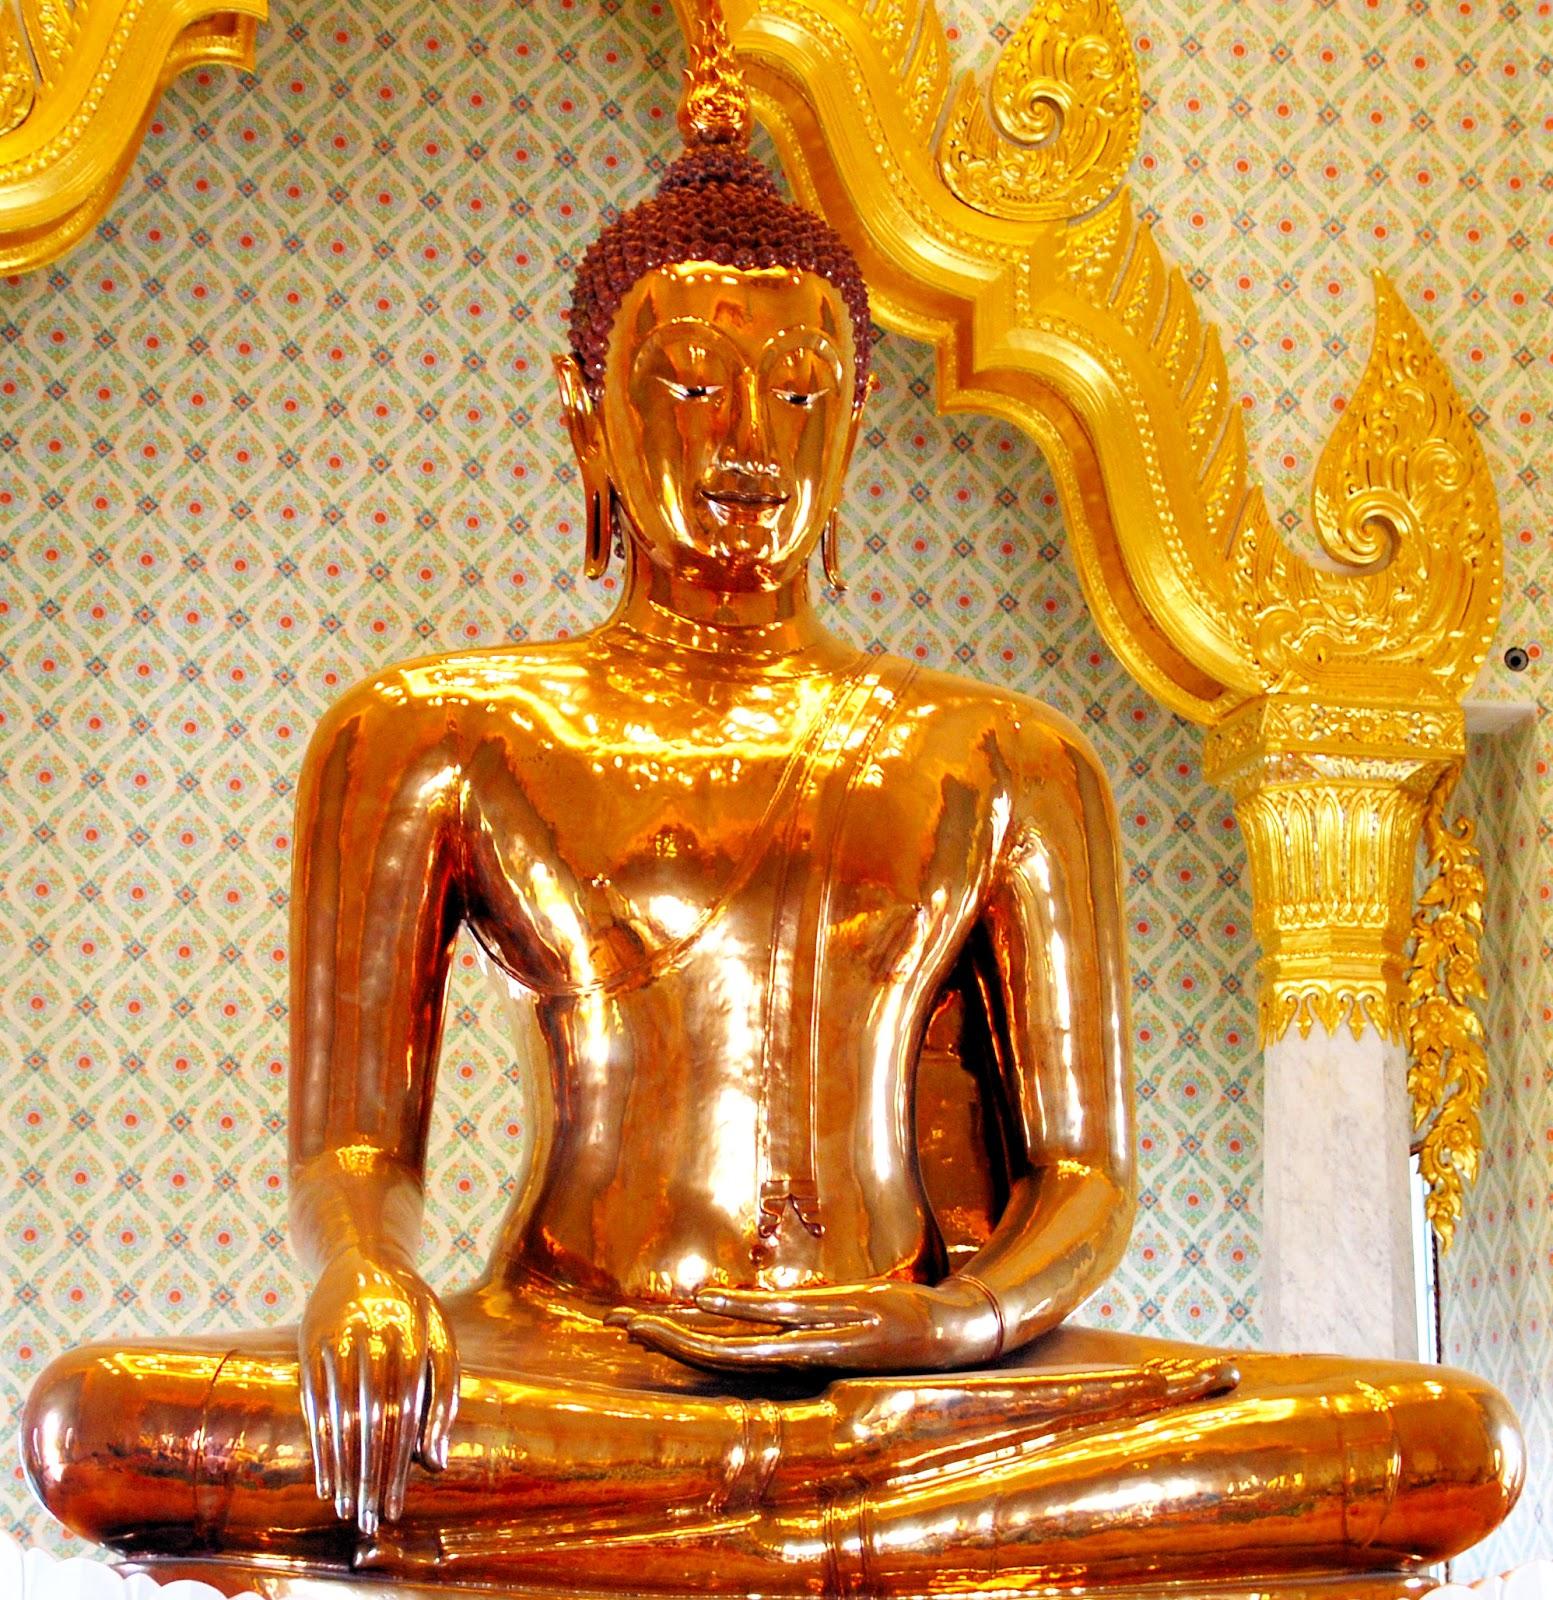 gold creek buddhist dating site Buddhist dating site, buddhist personals, buddhist singles, buddhist chat - free online dating free buddhist dating site.